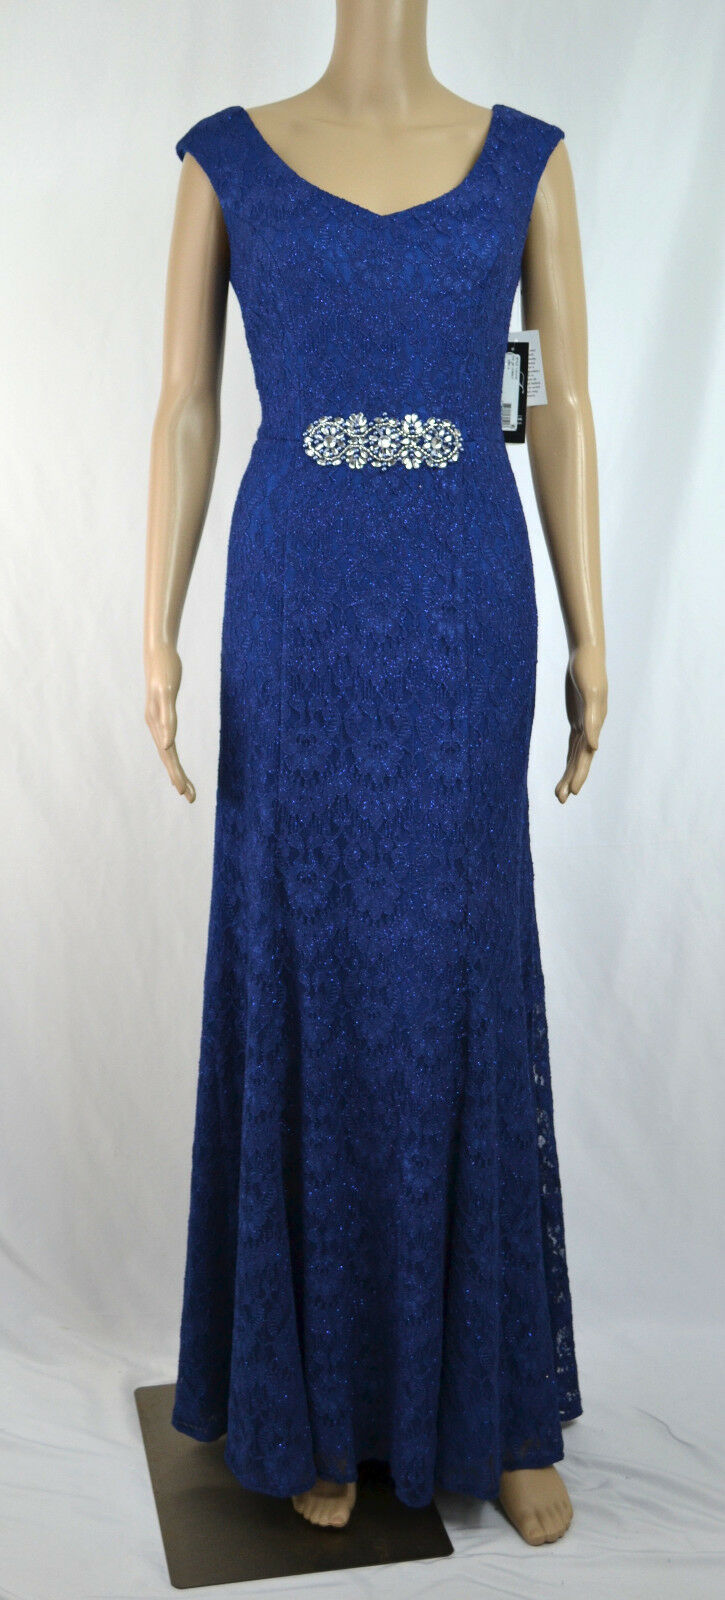 Alex Evenings NEW Blau Woherren Größe 6 Shimmer Lace Sheath Dress